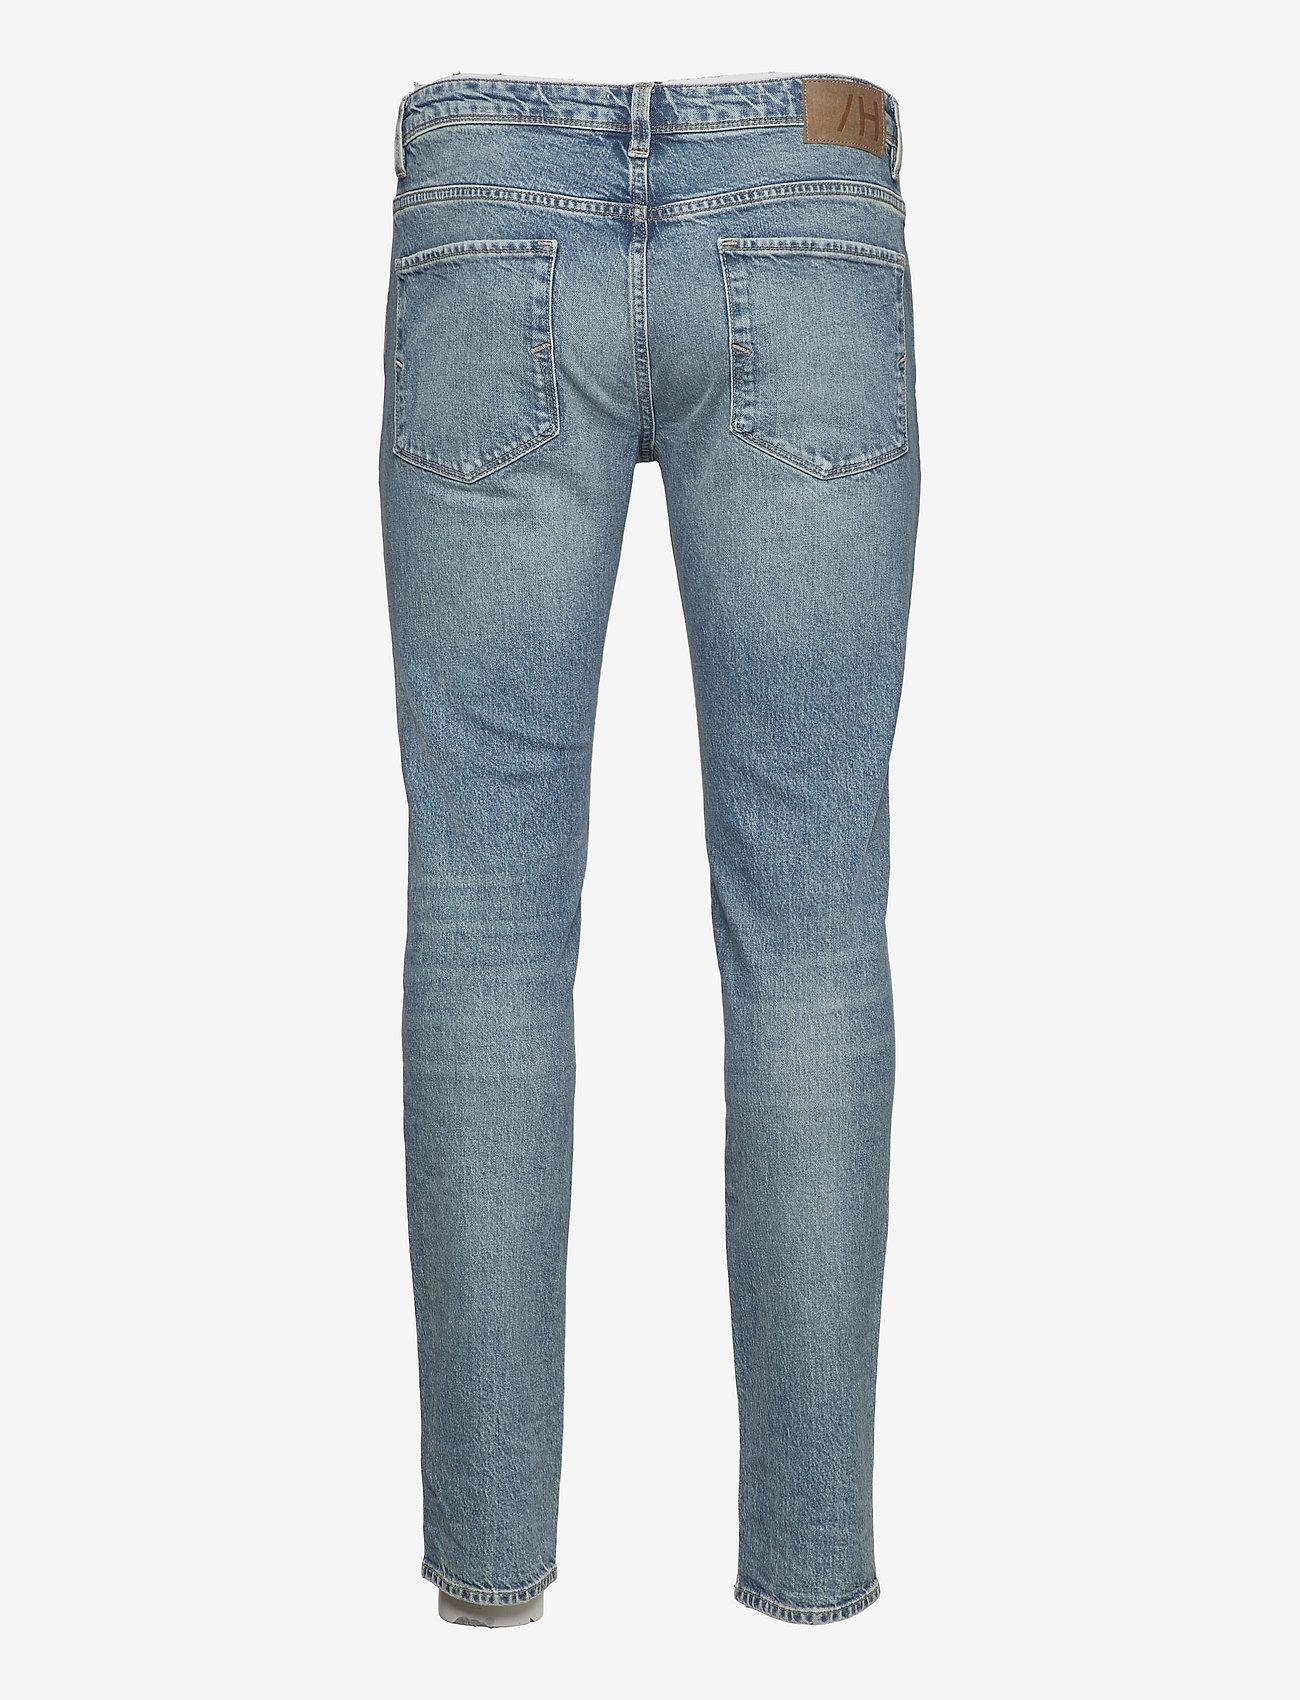 Selected Homme - SLHSLIM-LEON 6290 L.BLUE ST JEANS U - slim jeans - light blue denim - 1